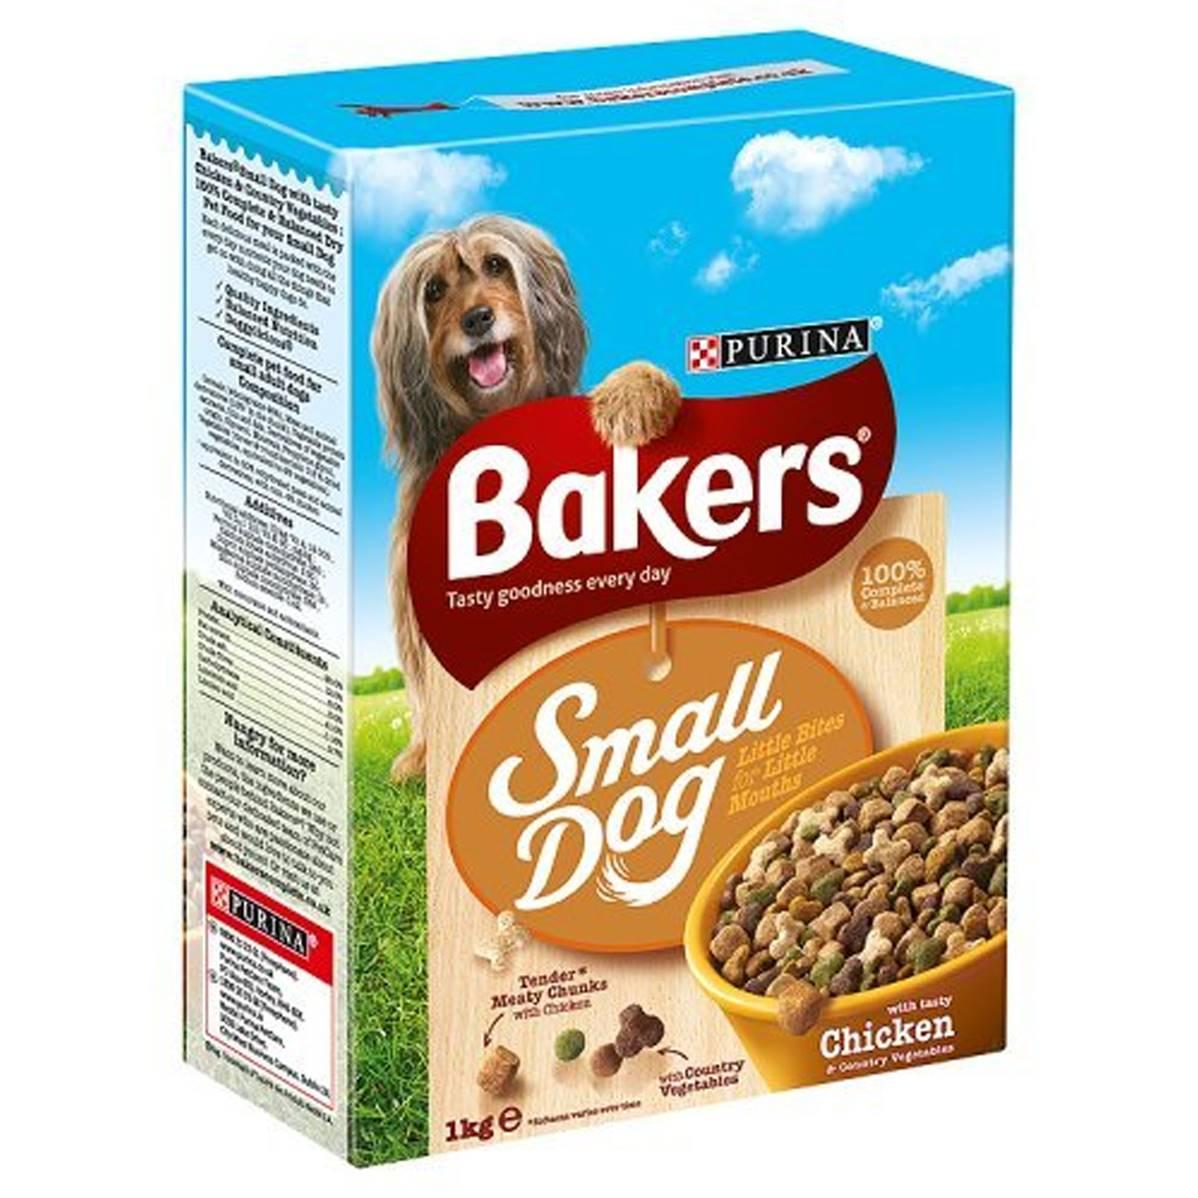 Bakers Dog Food Additives